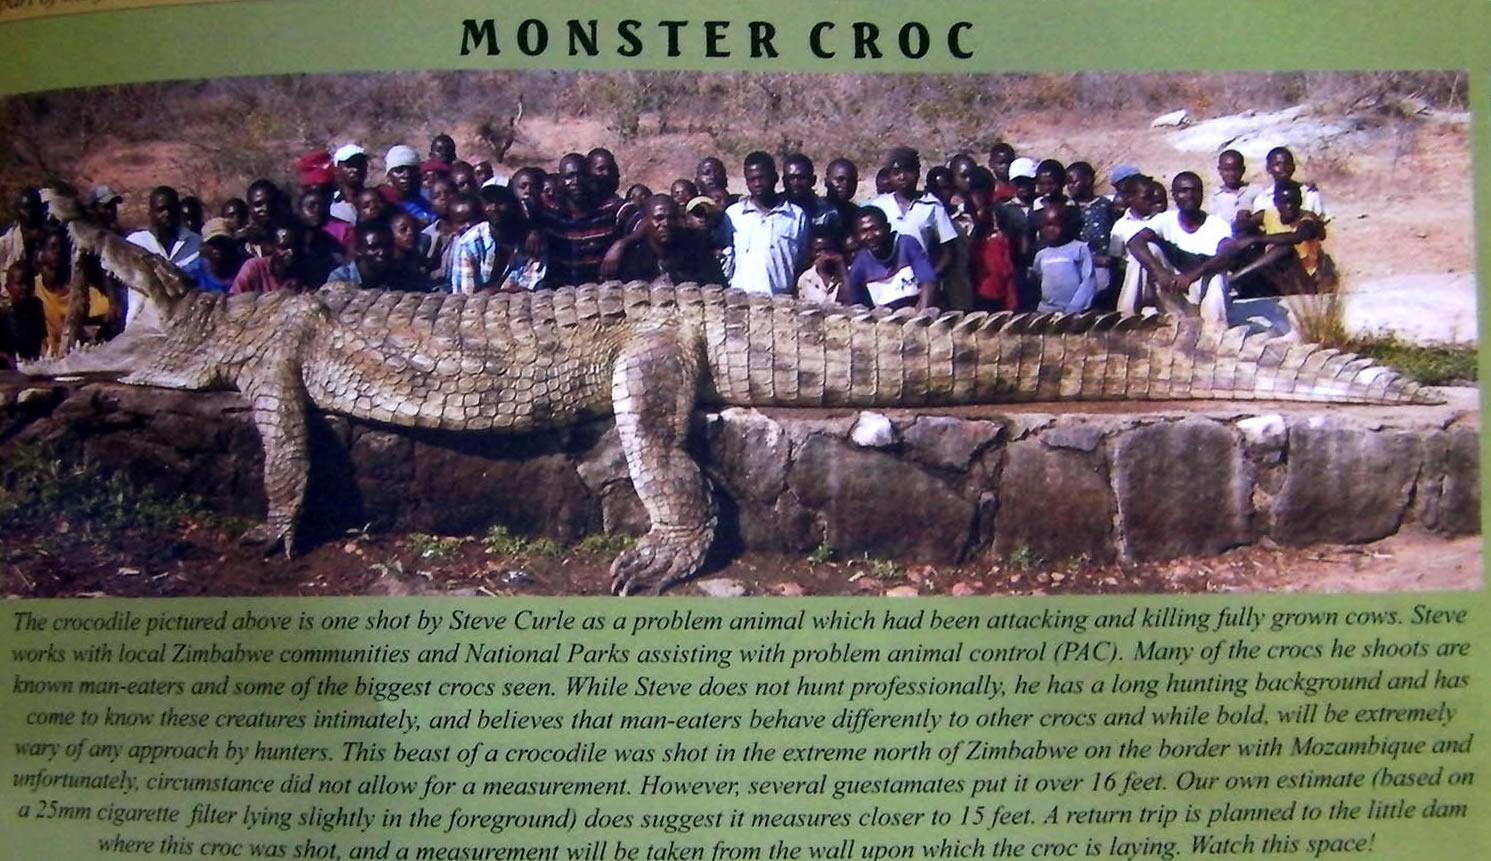 http://www.abolitionist.com/reprogramming/crocodile.jpg